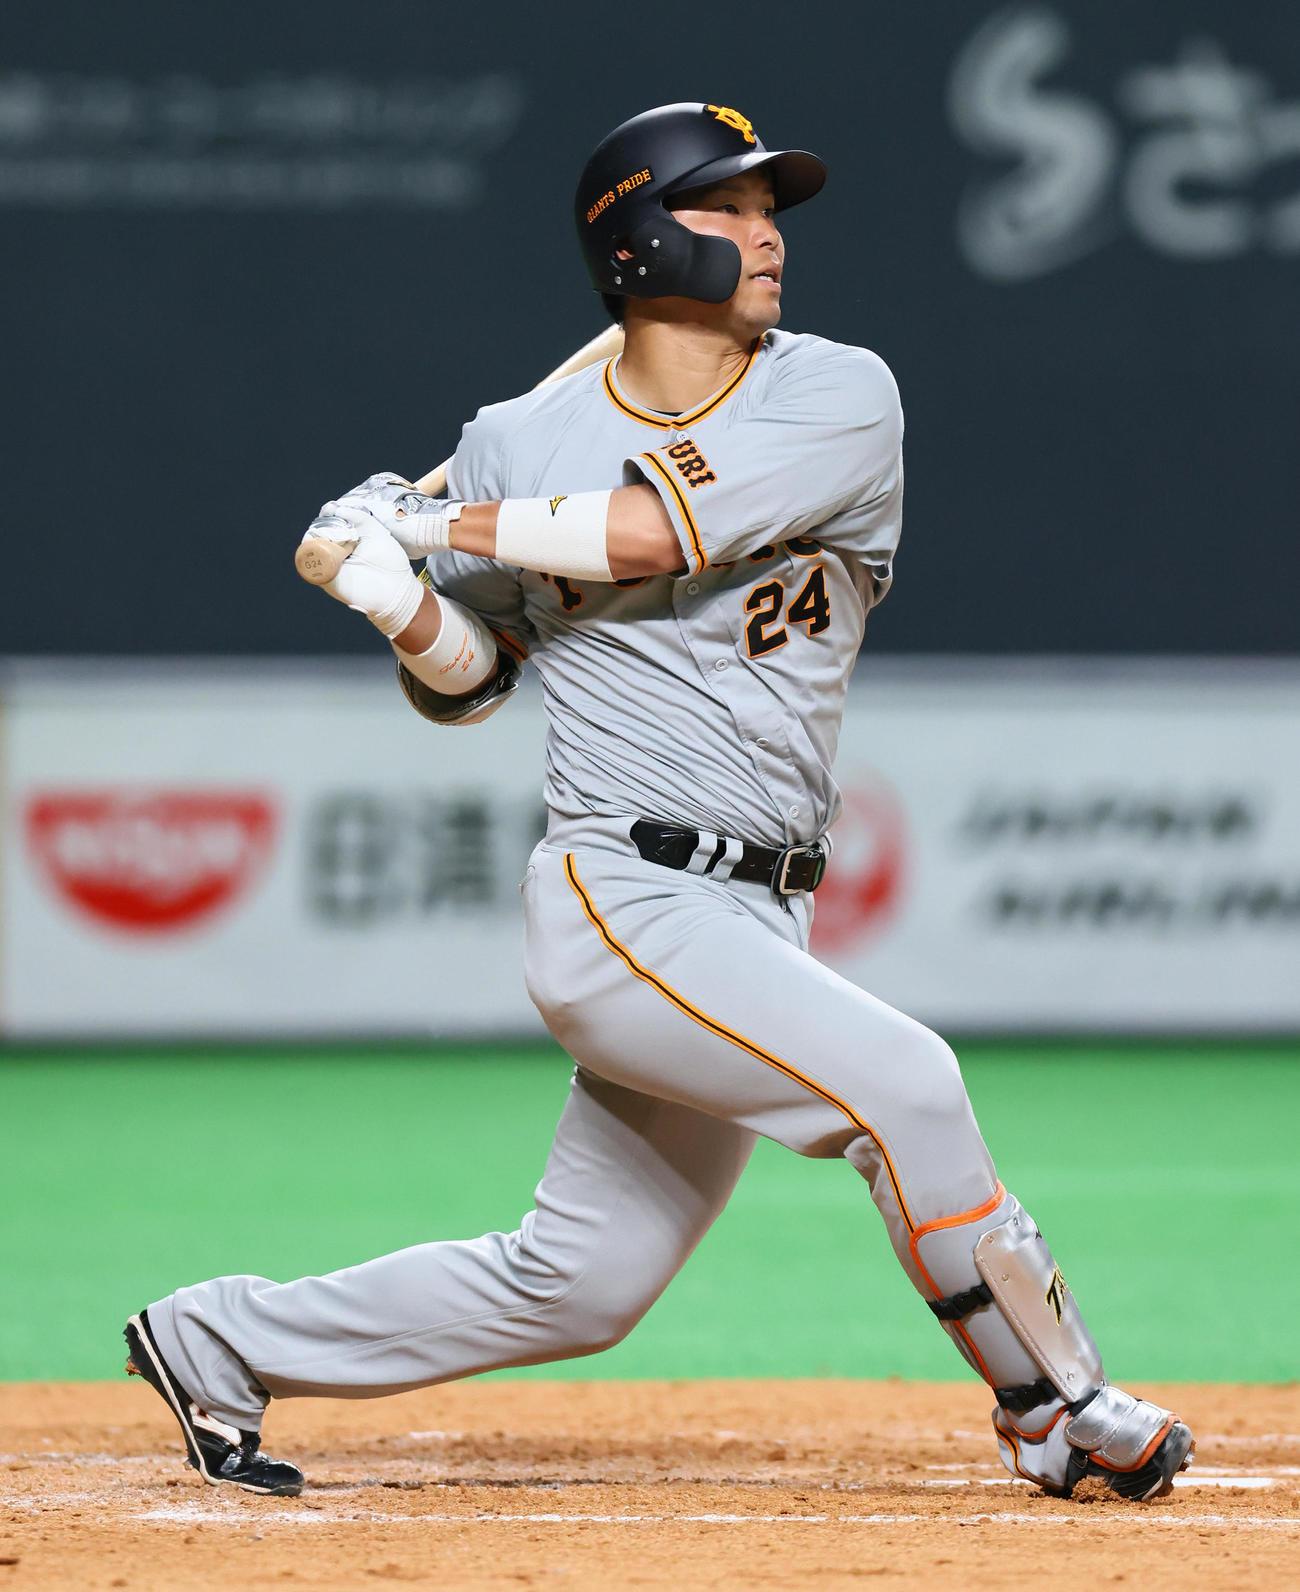 日本ハム対巨人 3回表巨人2死一塁、大城は右翼線適時二塁打を放つ(撮影・足立雅史)